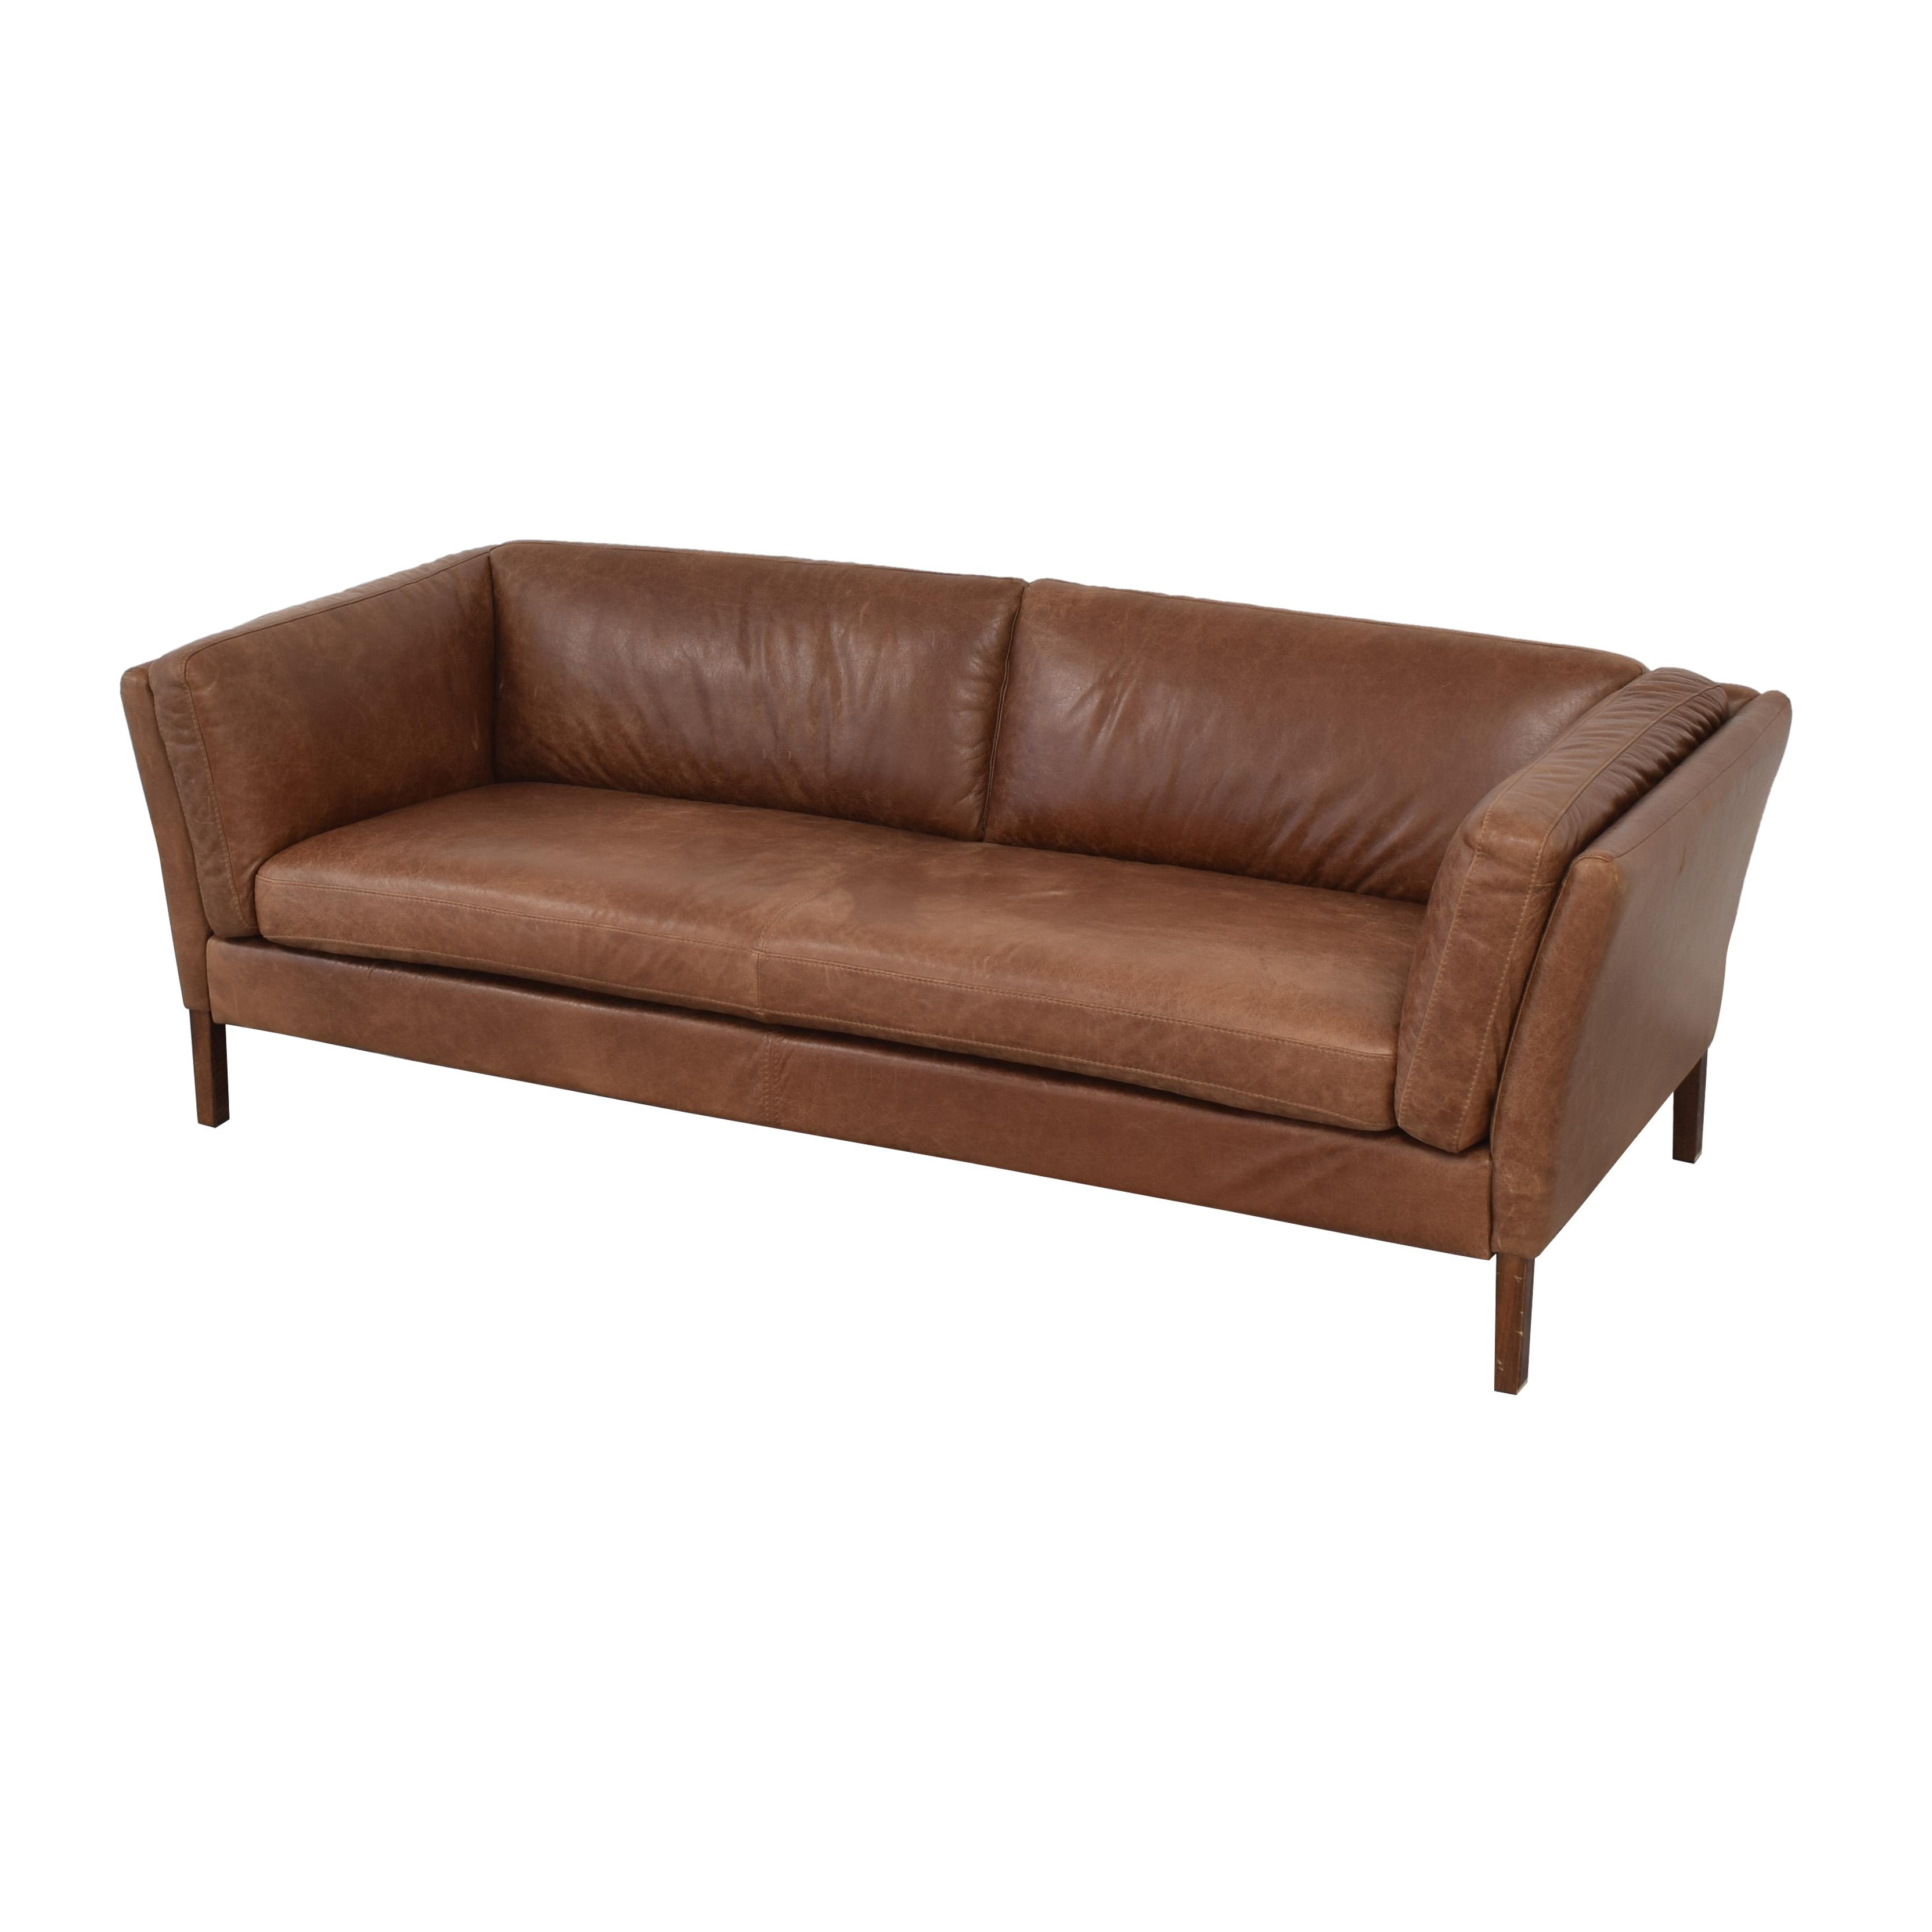 shop  Bench Cushion Sofa online